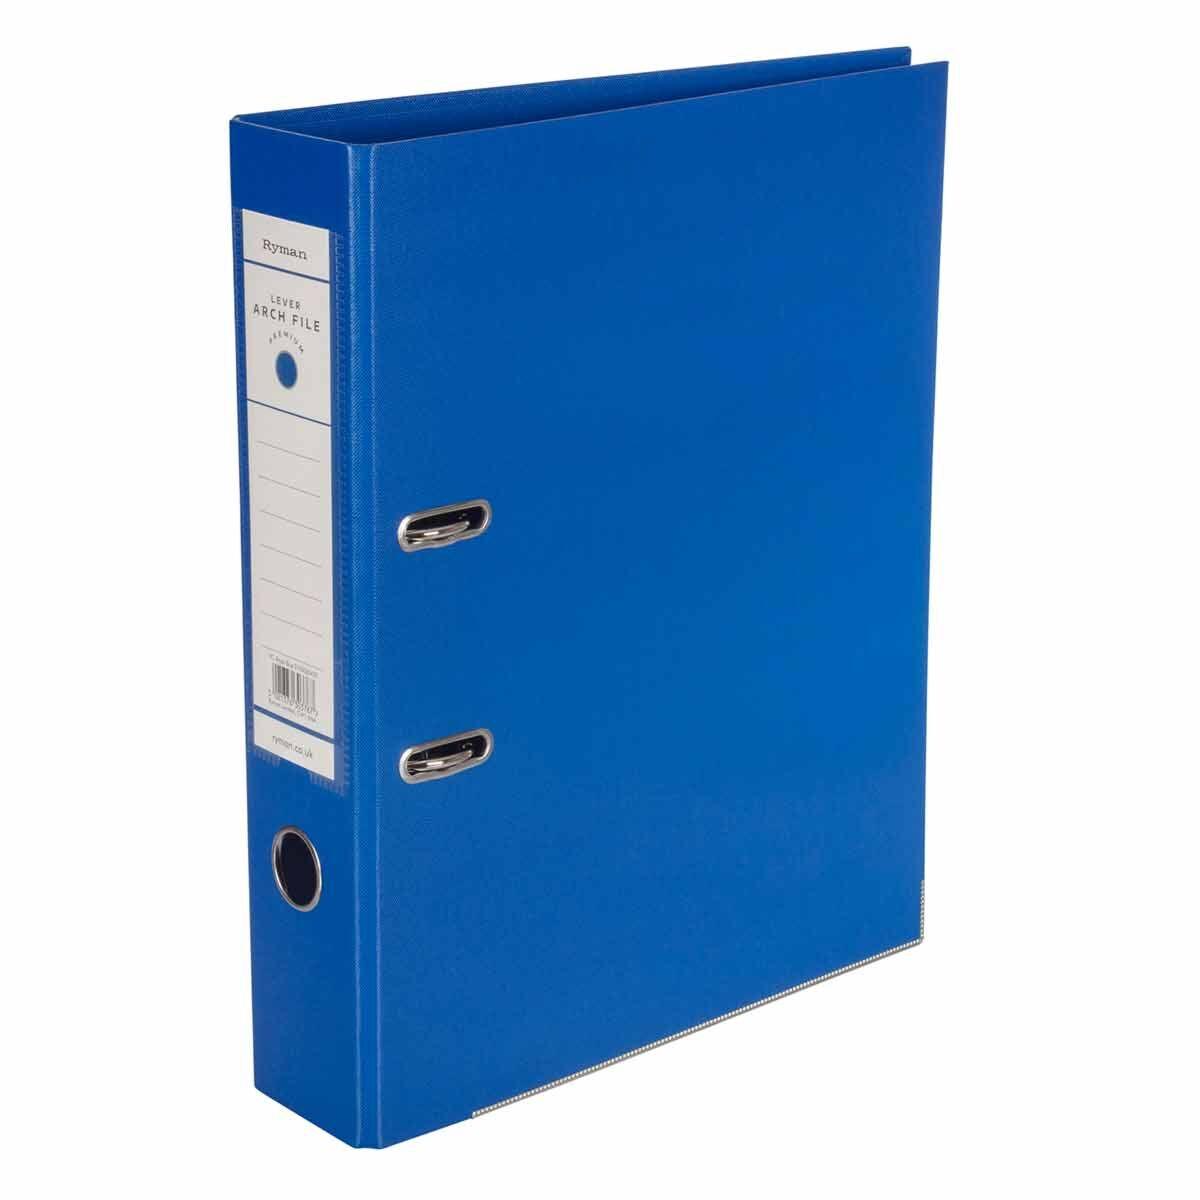 Ryman Premium Lever Arch File Foolscap Royal Blue